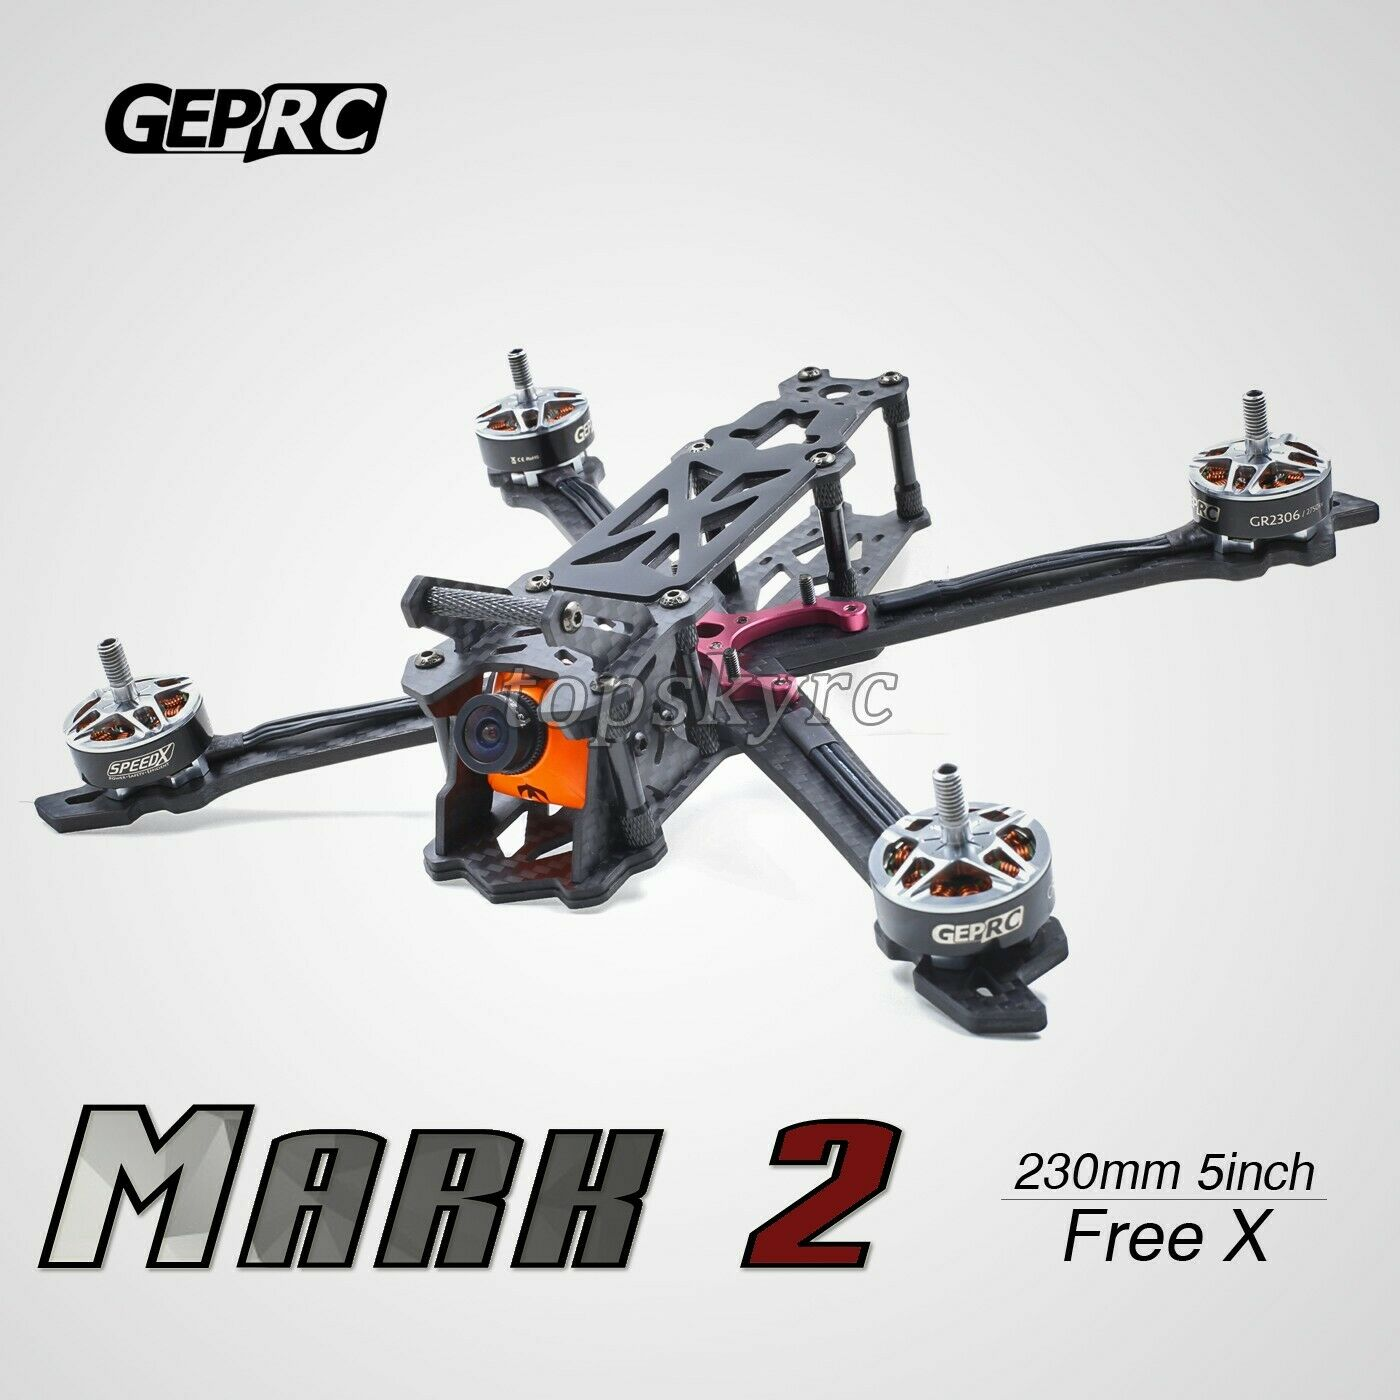 200mm vista en primera persona Racing Drone frame RC Drone frame inacabado Cuadricóptero GEP-Mark 2 TPS